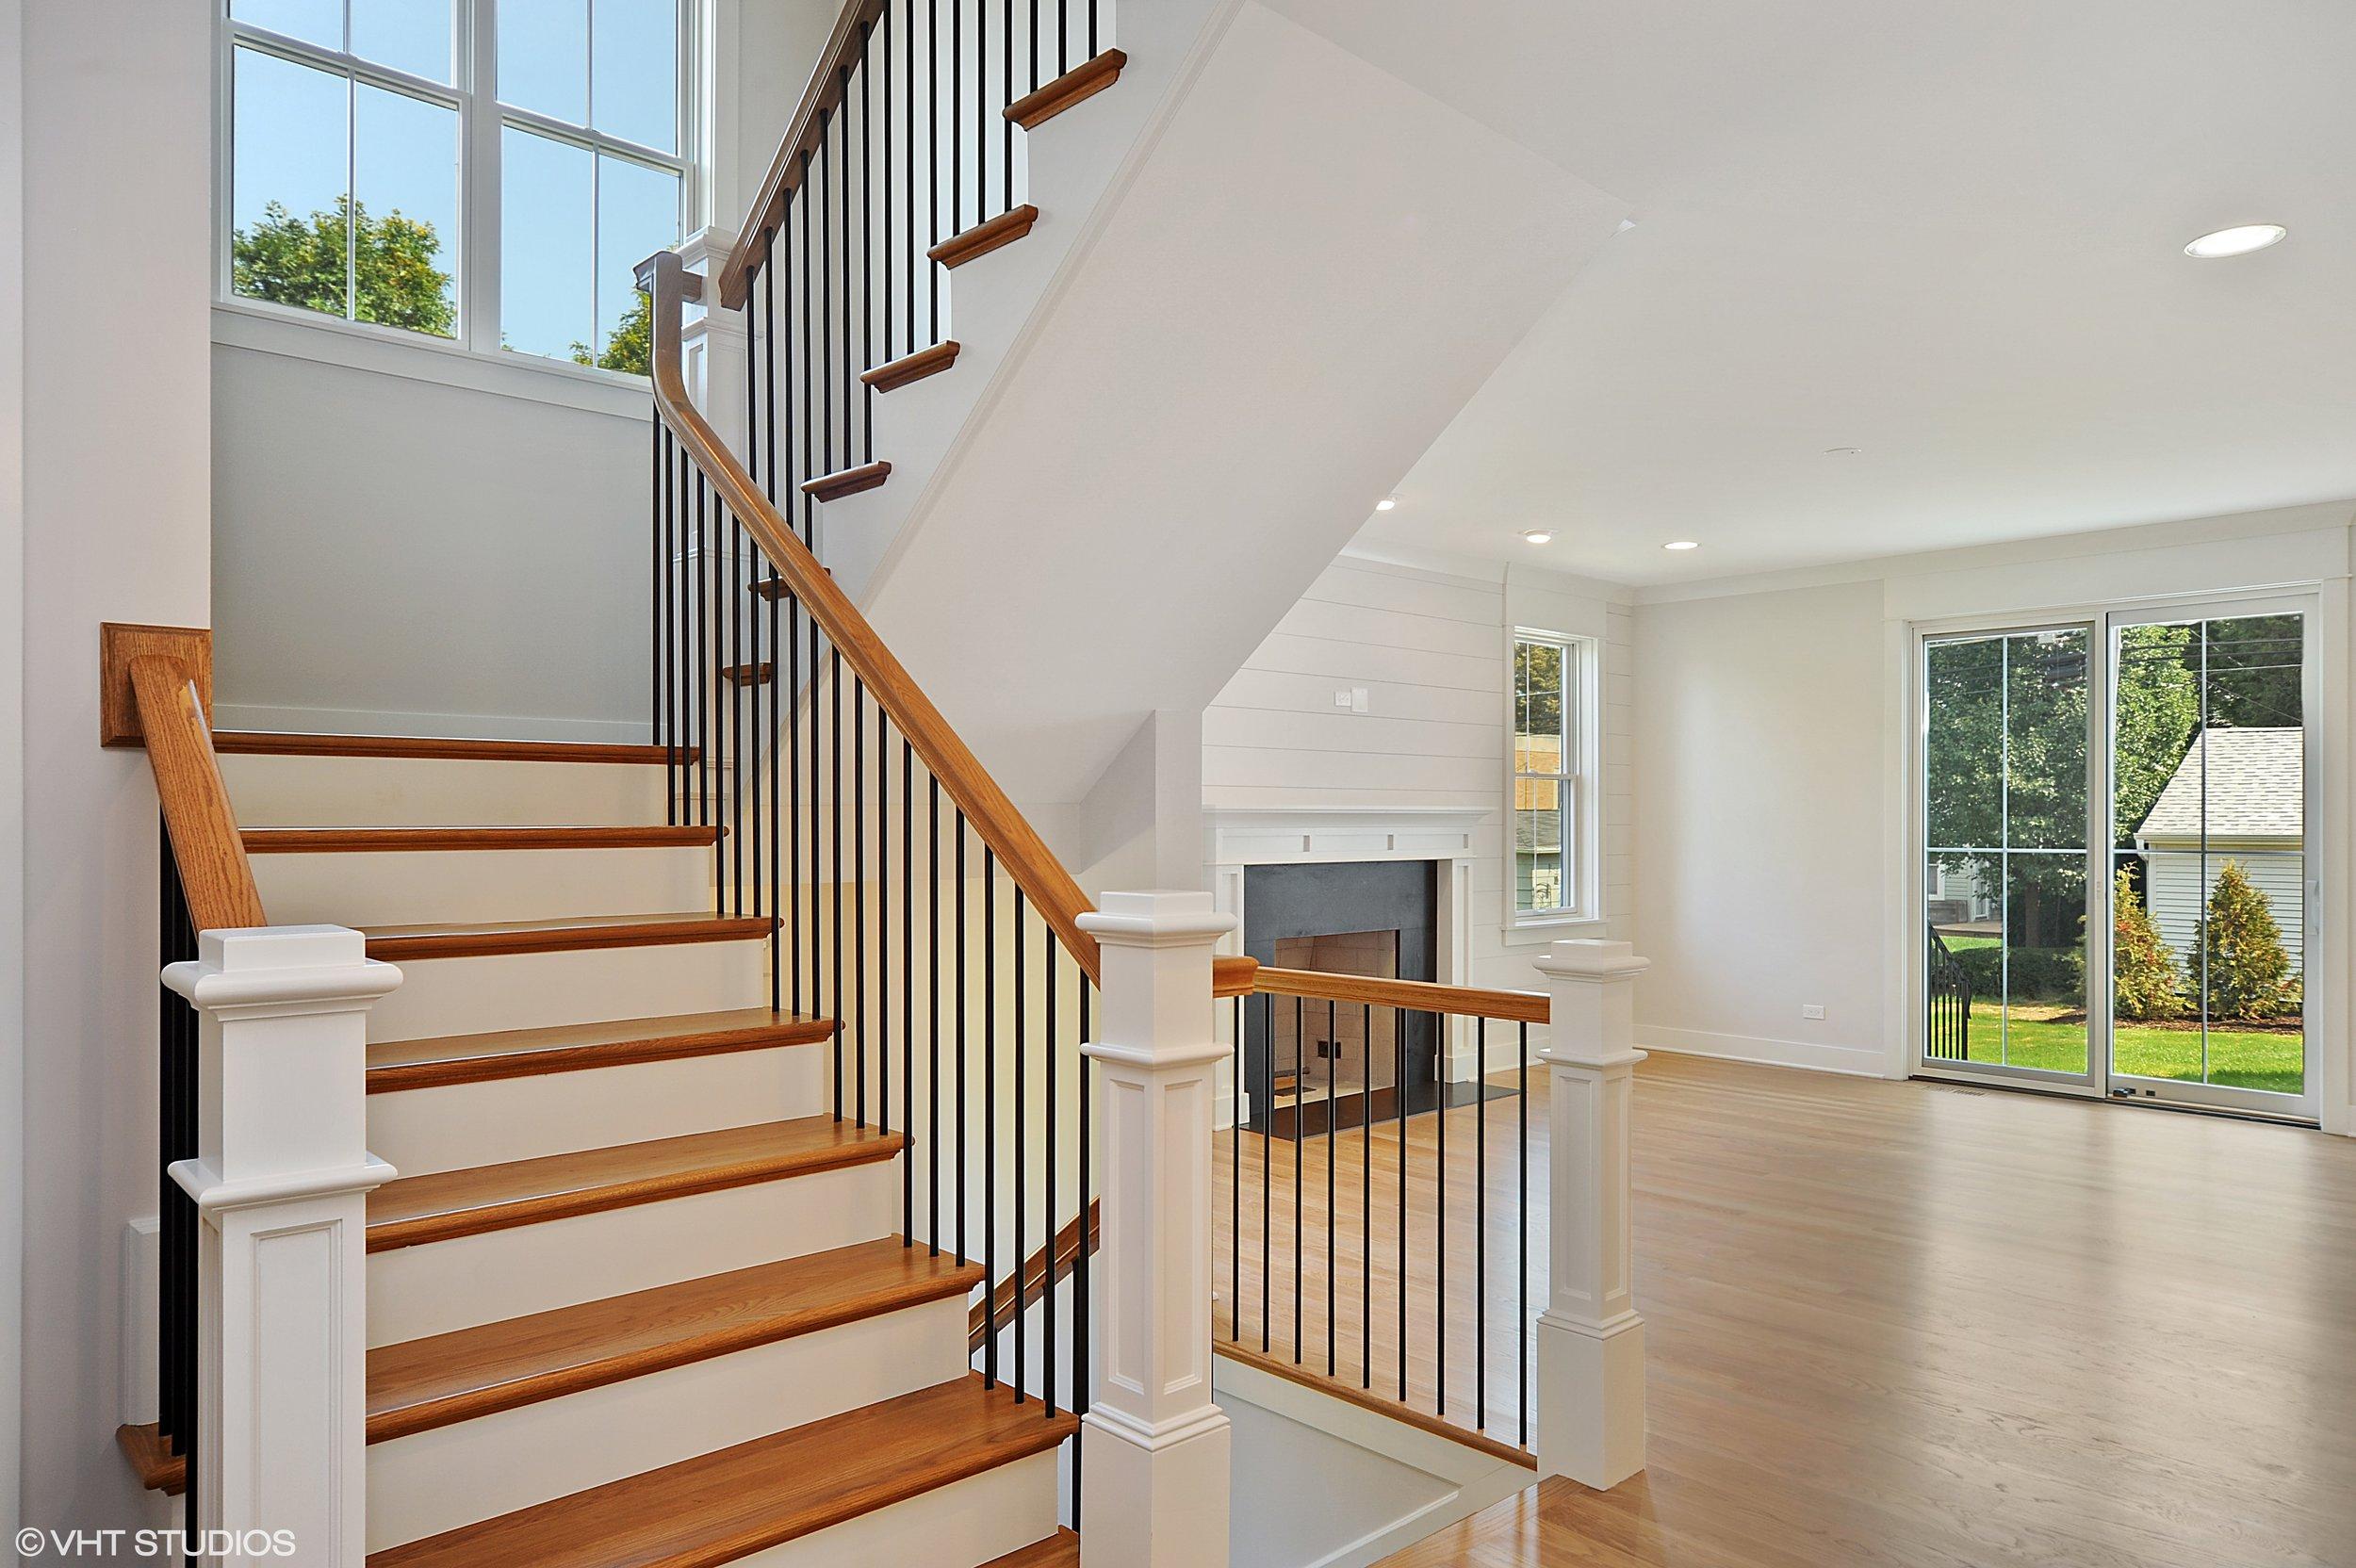 10_103northpineavenue_68_Staircase_HiRes.jpg